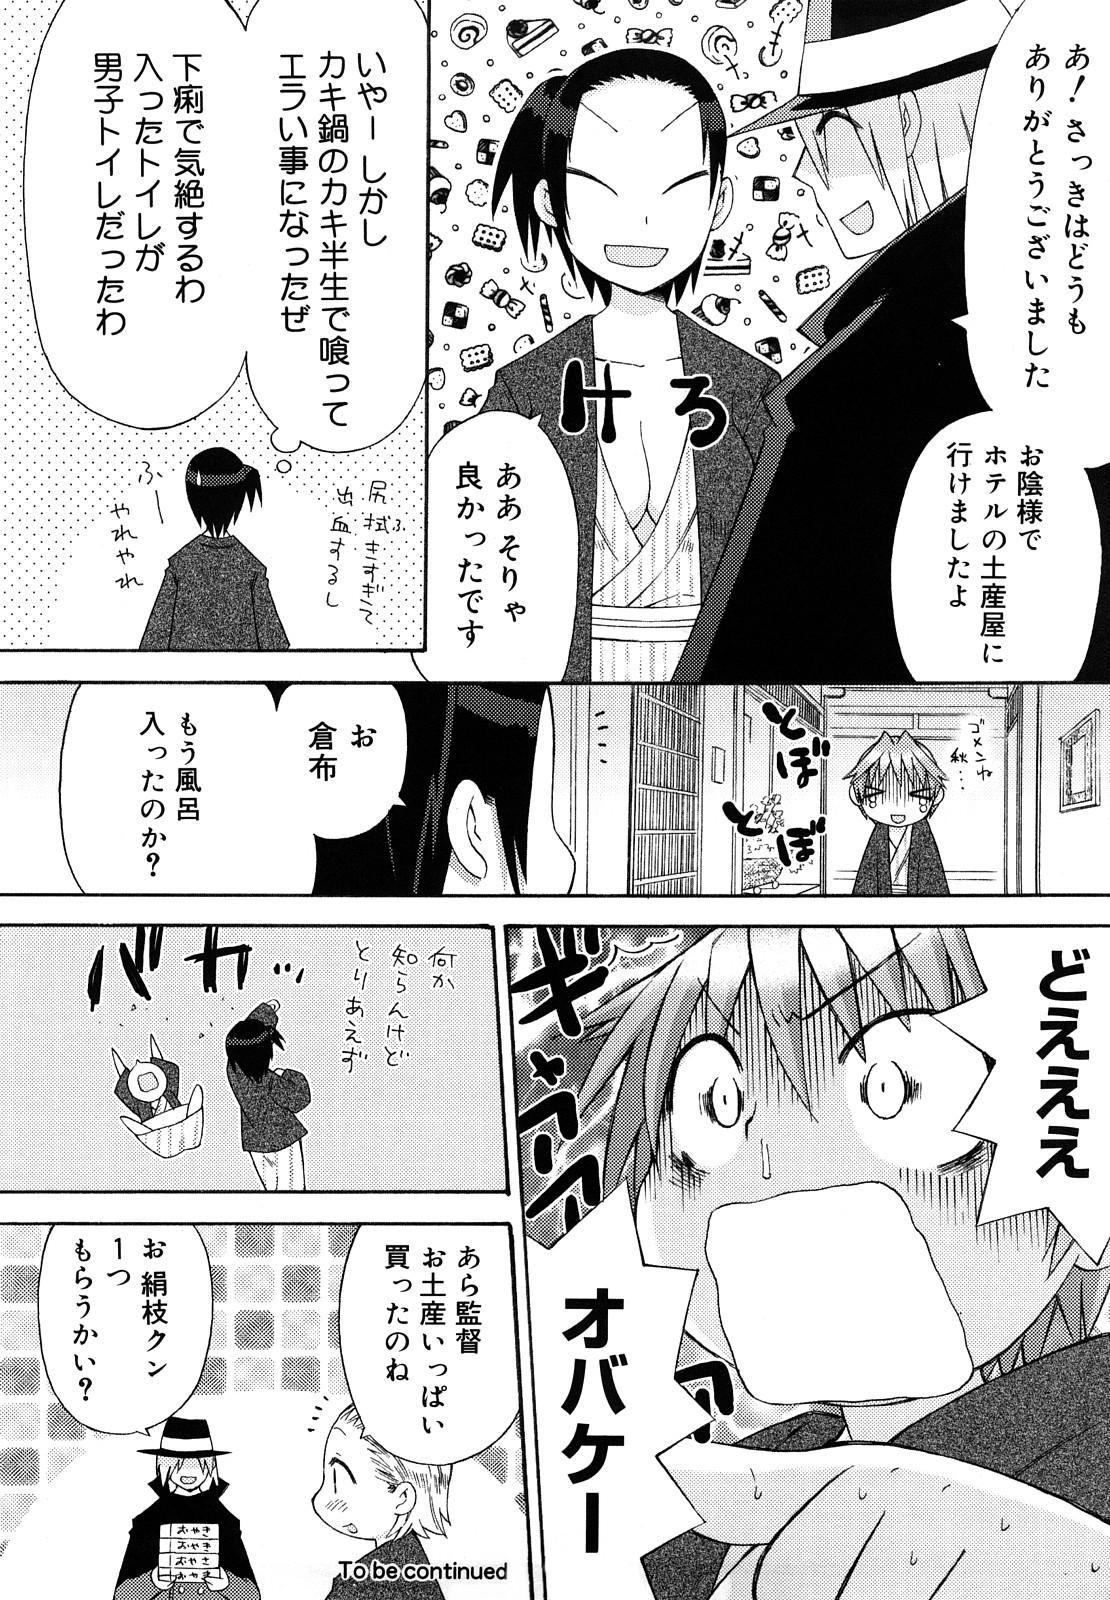 Hatsuden Pandakun! Shinsouban 148